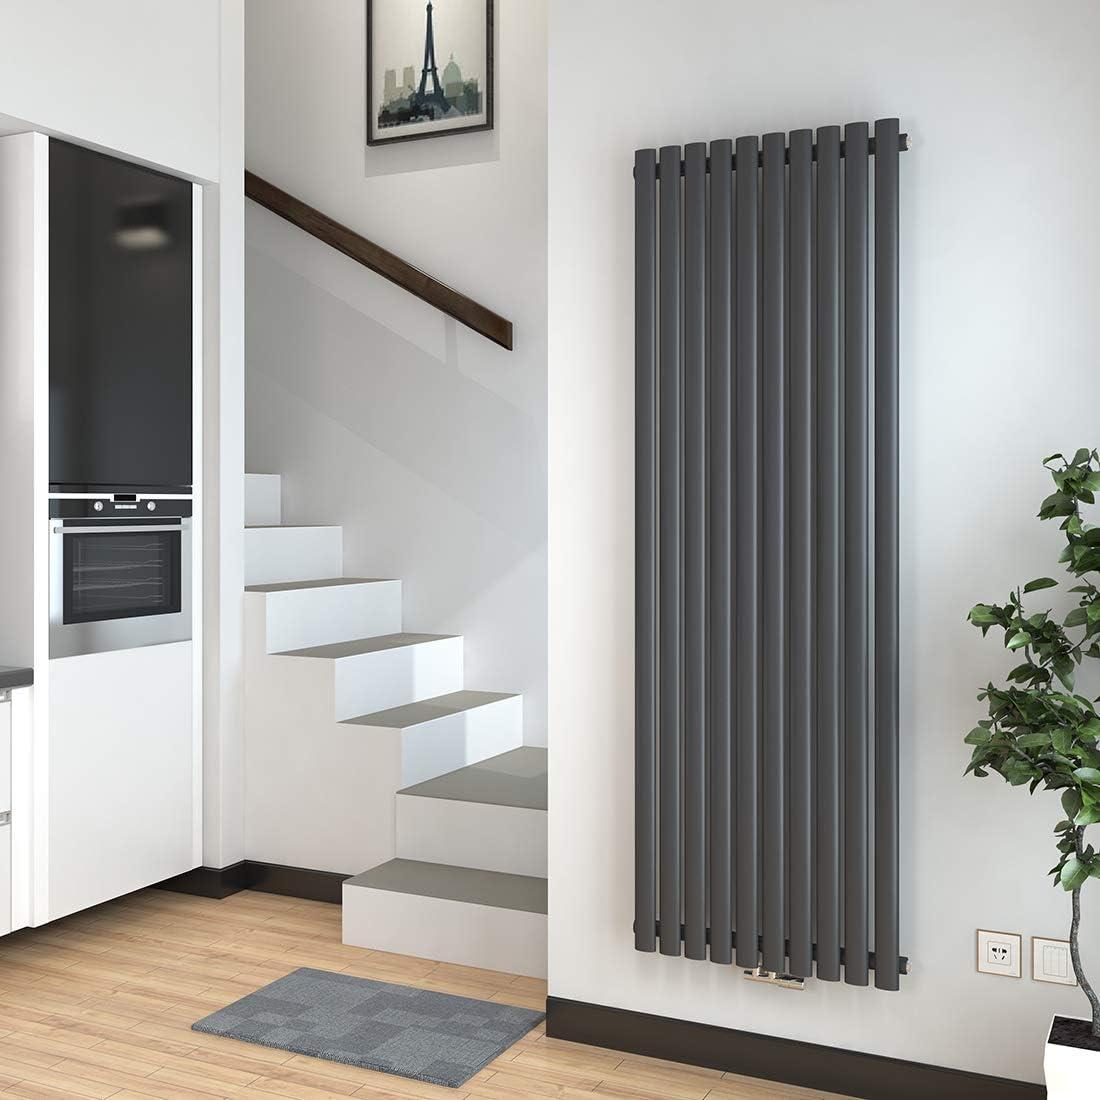 Meykoers Design-Heizk/örper Wei/ß Vertikal 1800x600mm Oval Heizung Mittelanschluss Doppellagig